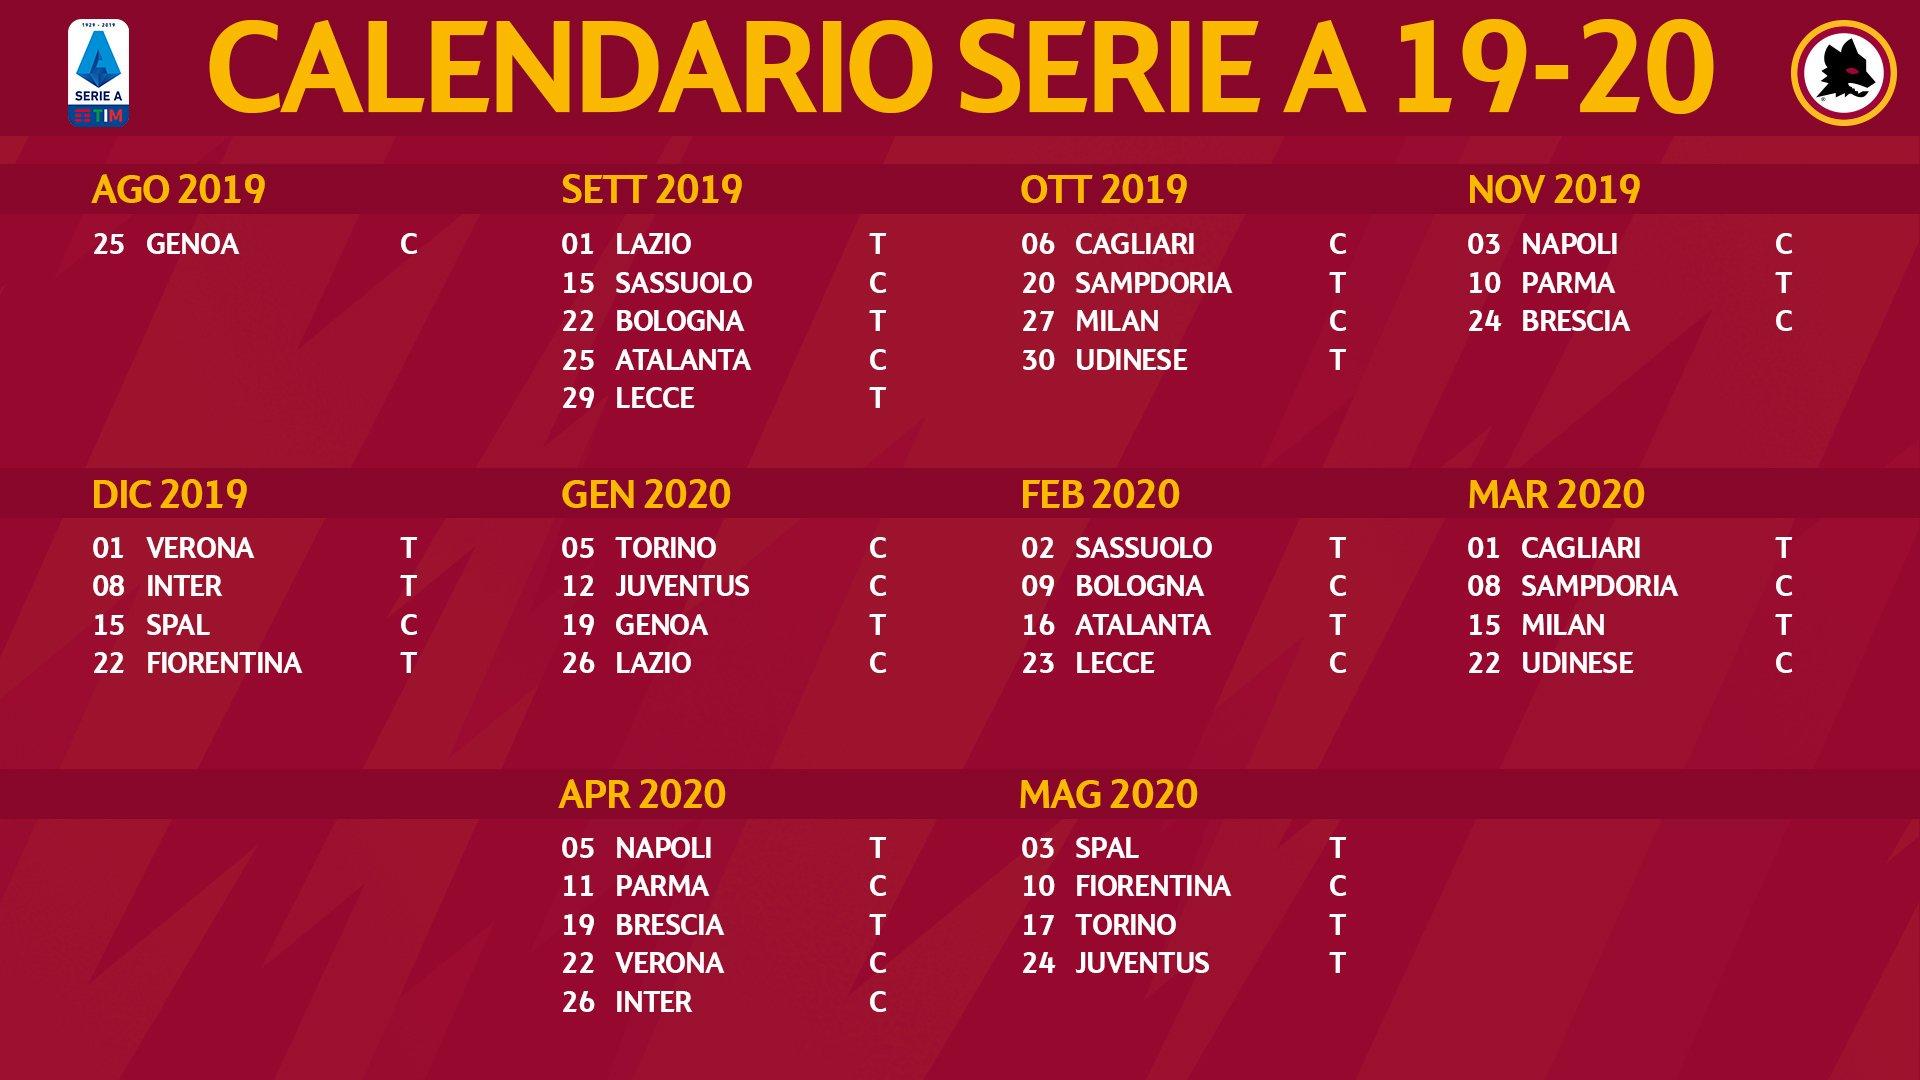 2018/19 Calcio Saga - Page 32 EAqjynIWwAUuFXG?format=jpg&name=large